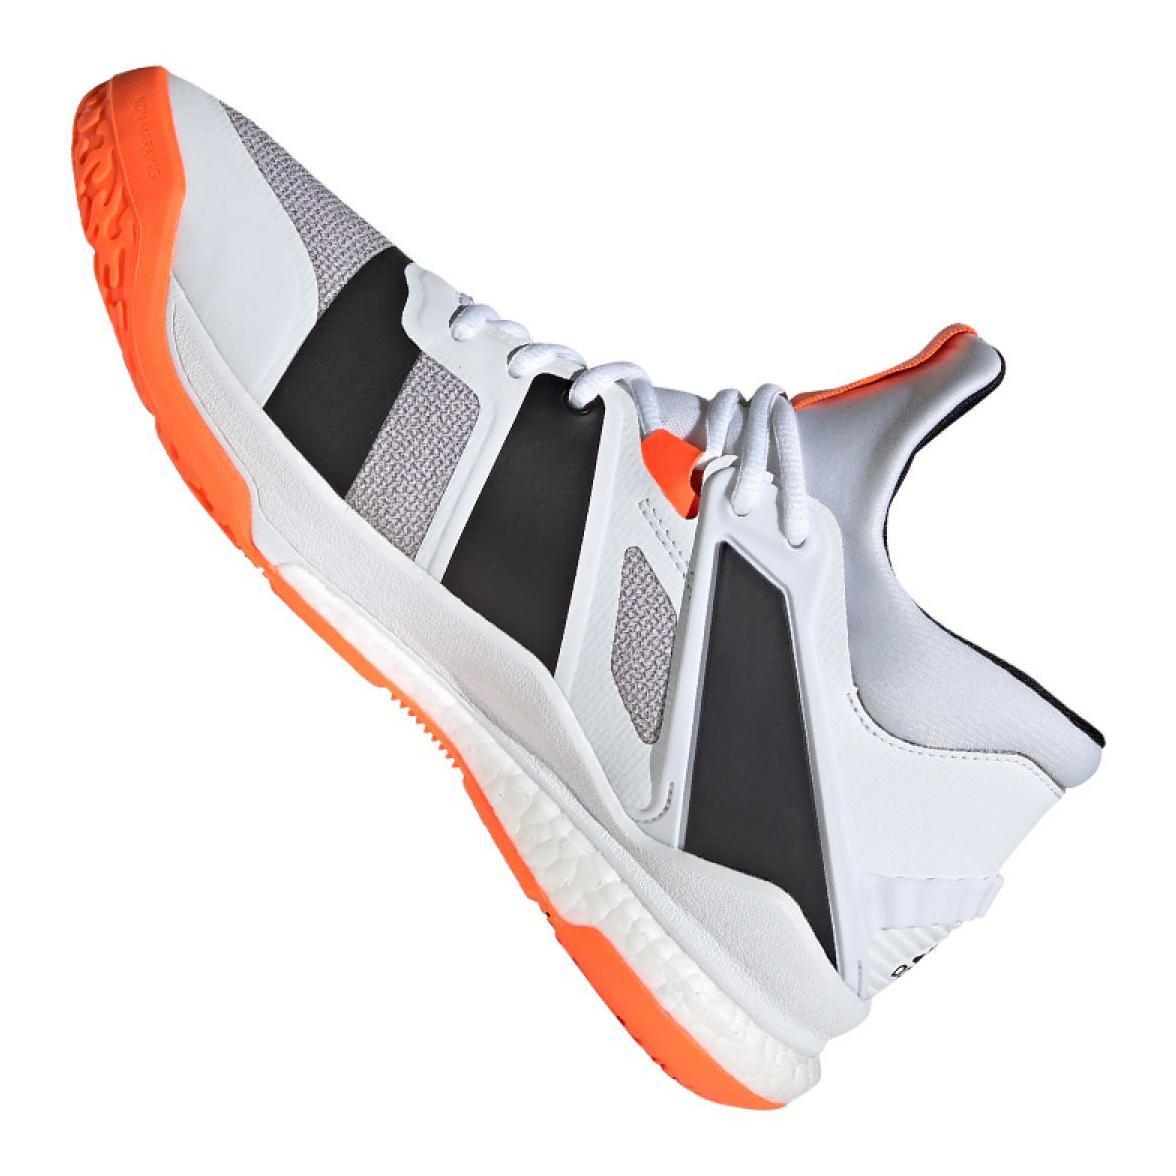 Sapatos Adidas Stabil X Mid M F33827 branco branco